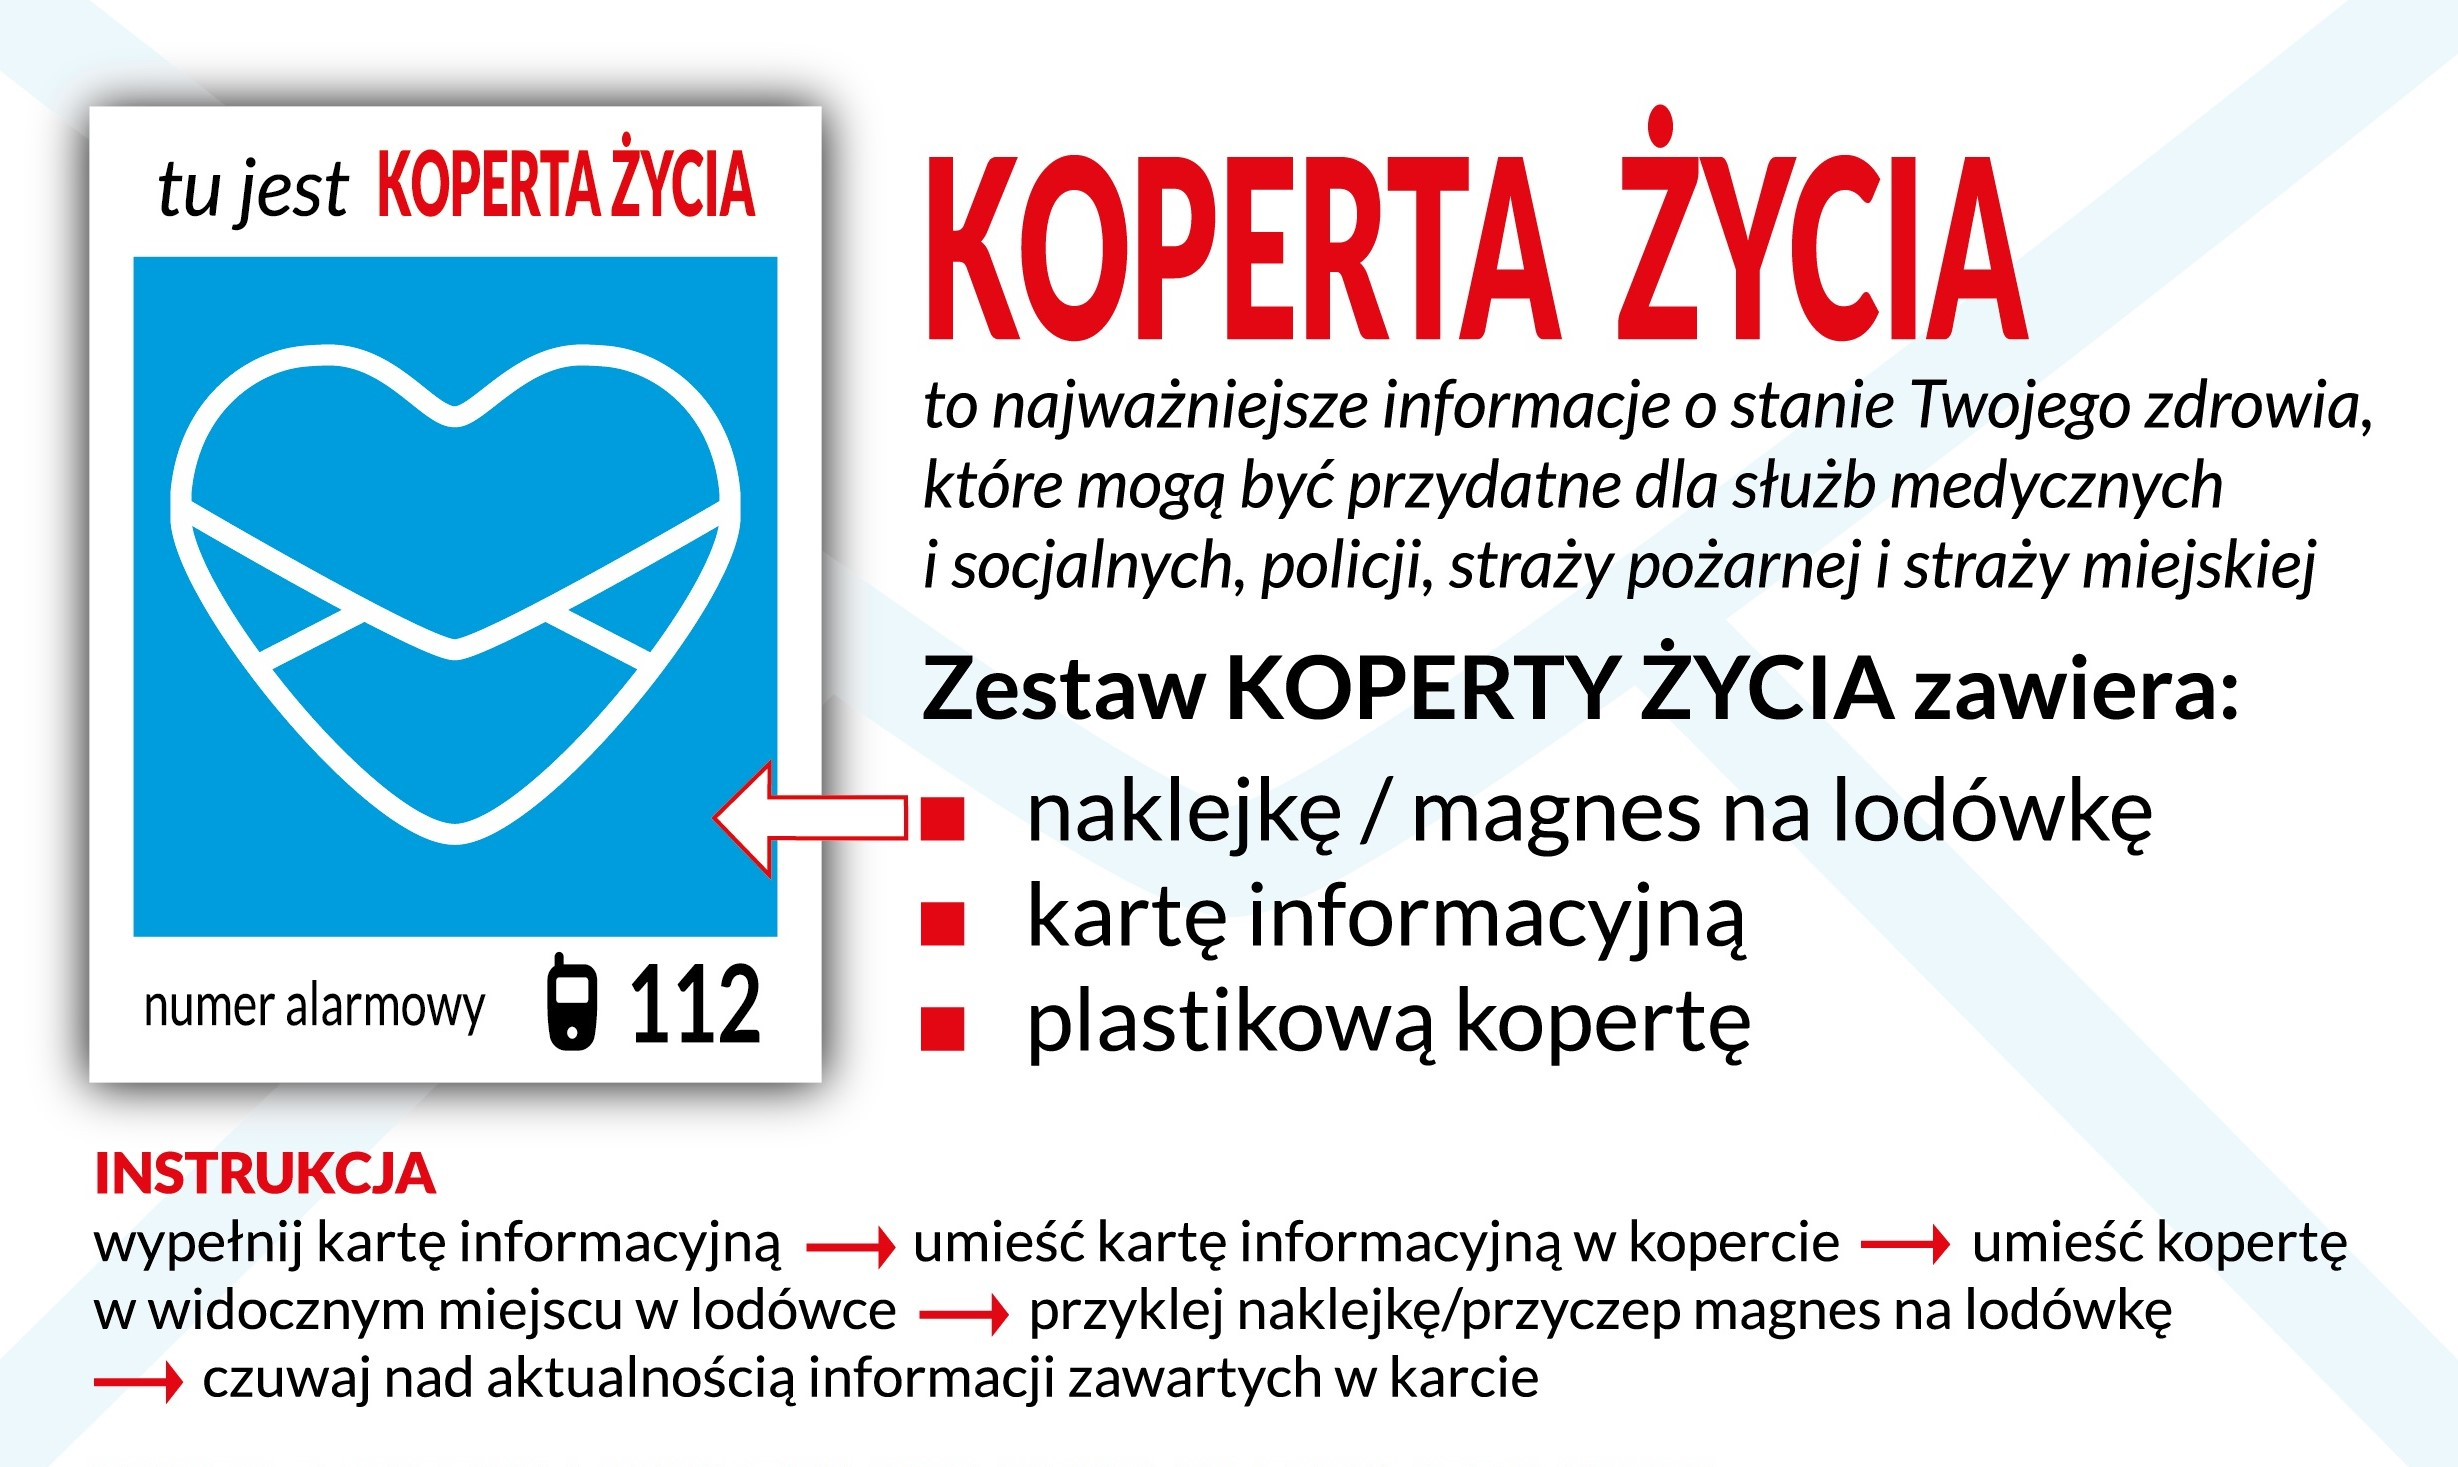 https://gminanml.pl/system/pobierz.php?id=1470